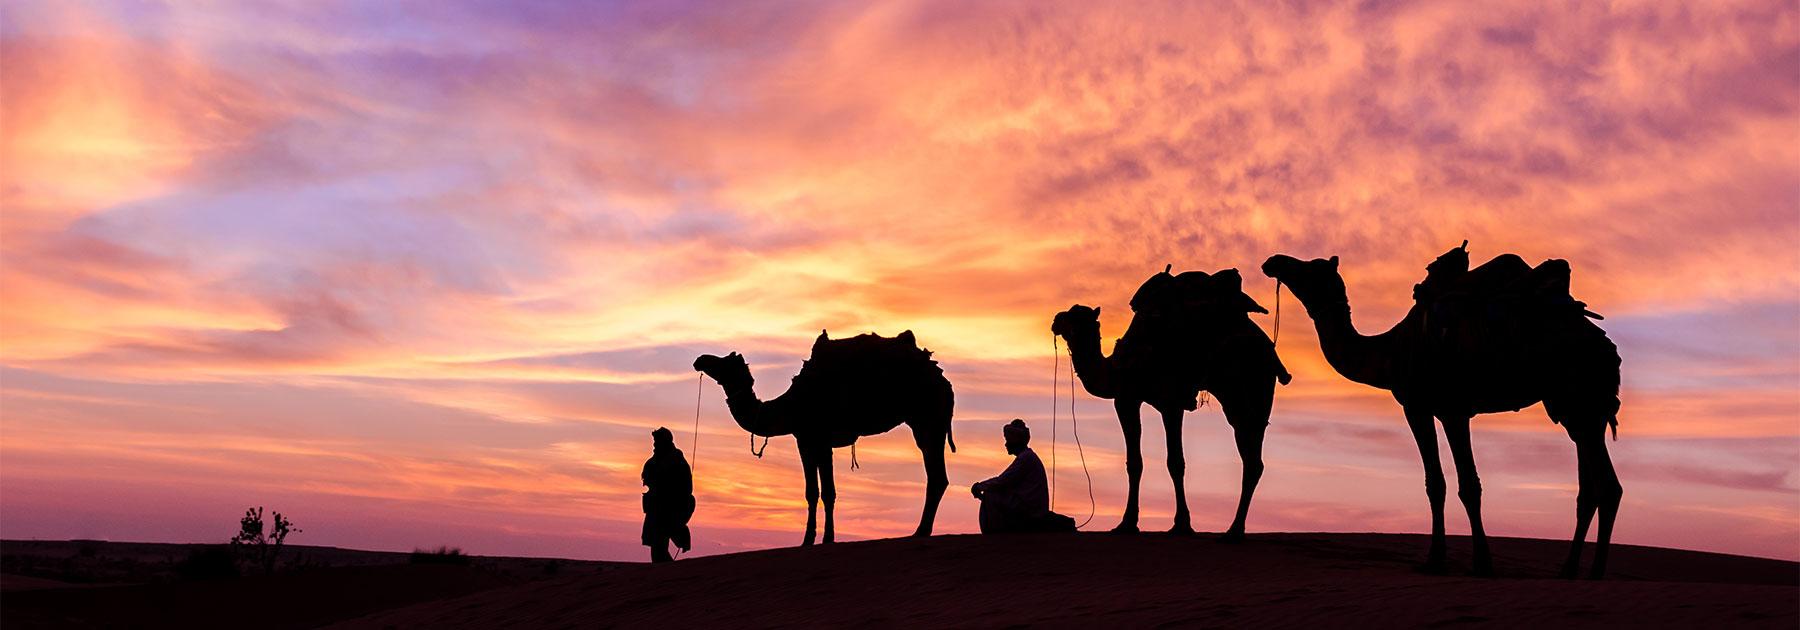 United Arab Emirates   امارات متحده عربی